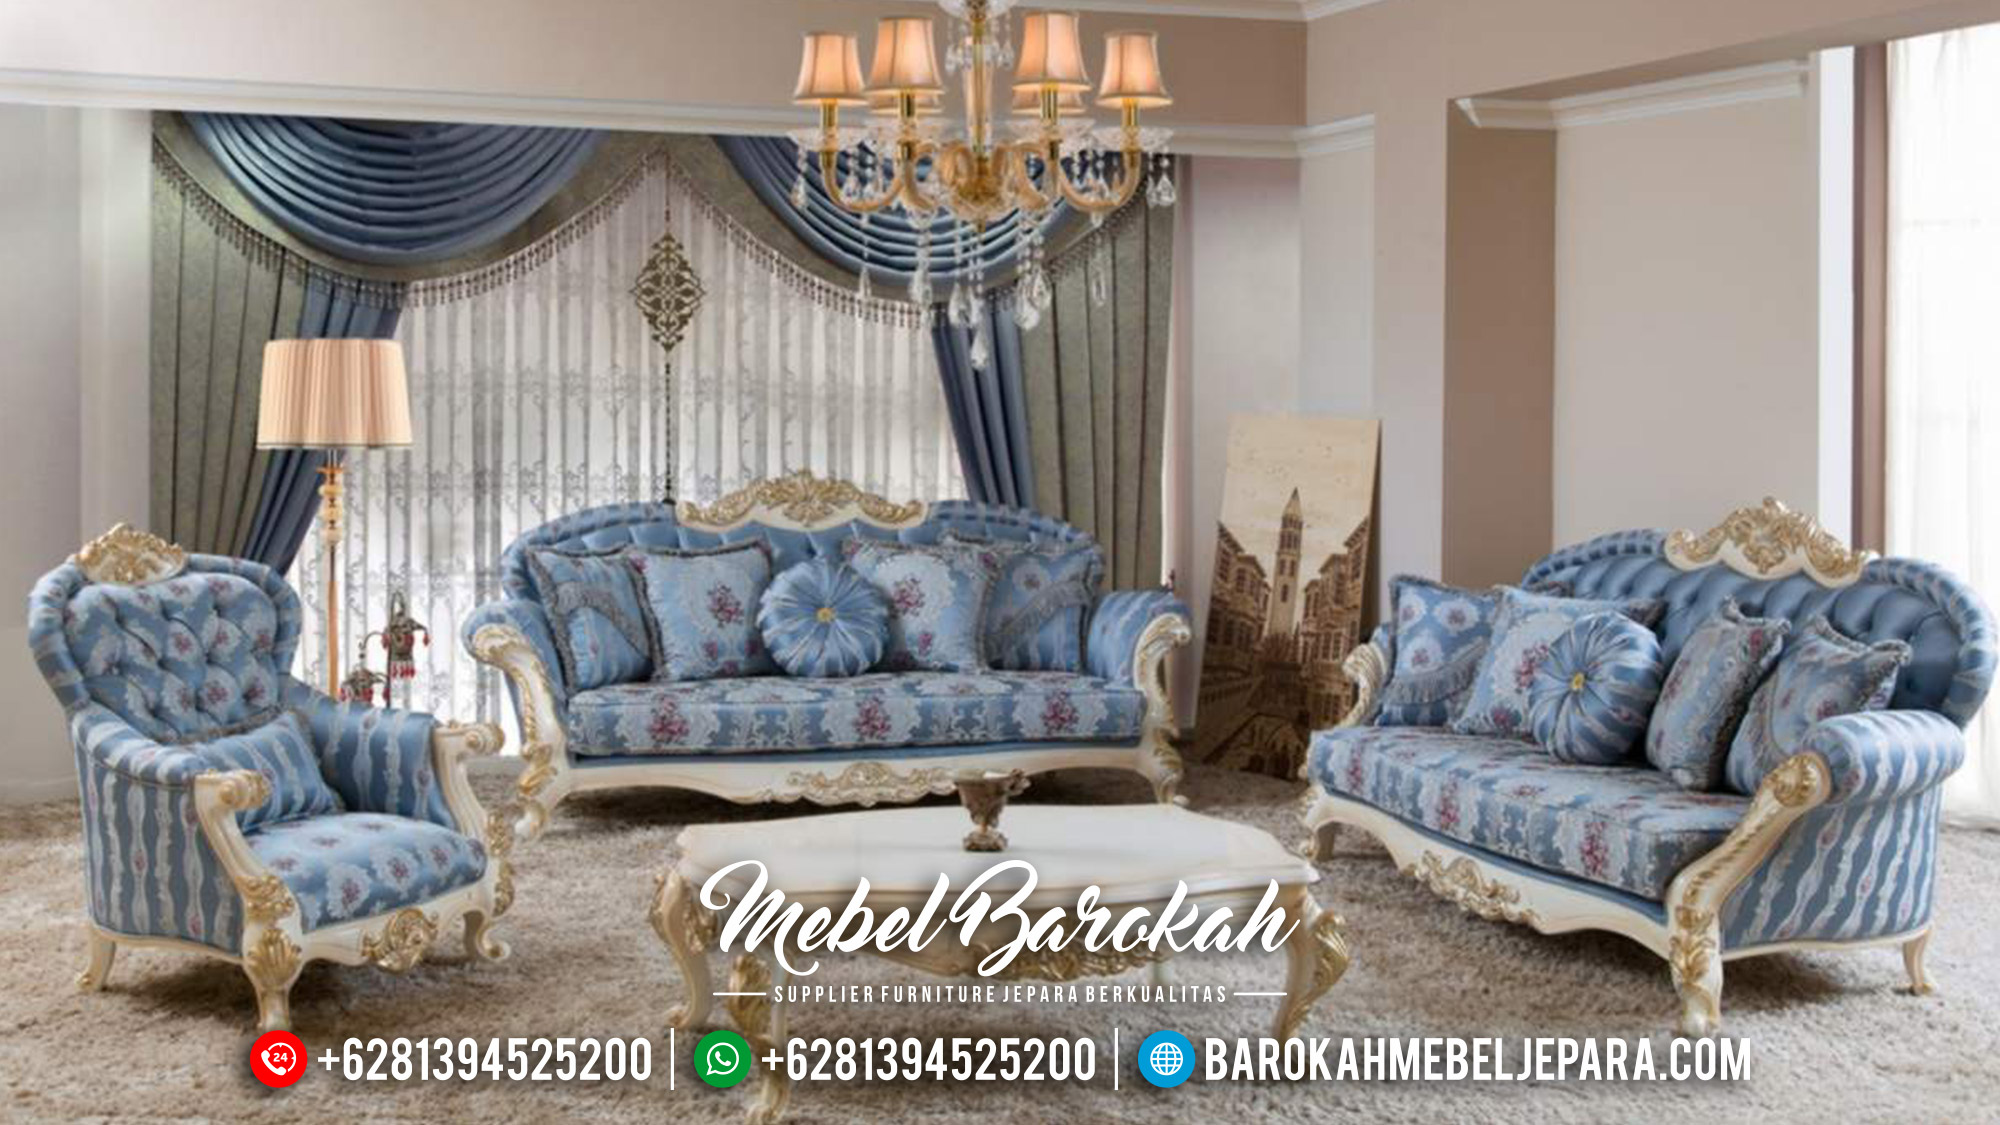 Furniture Jepara Sofa Tamu Mewah Ukiran Luxury Set Great Solid Wood MB-0580